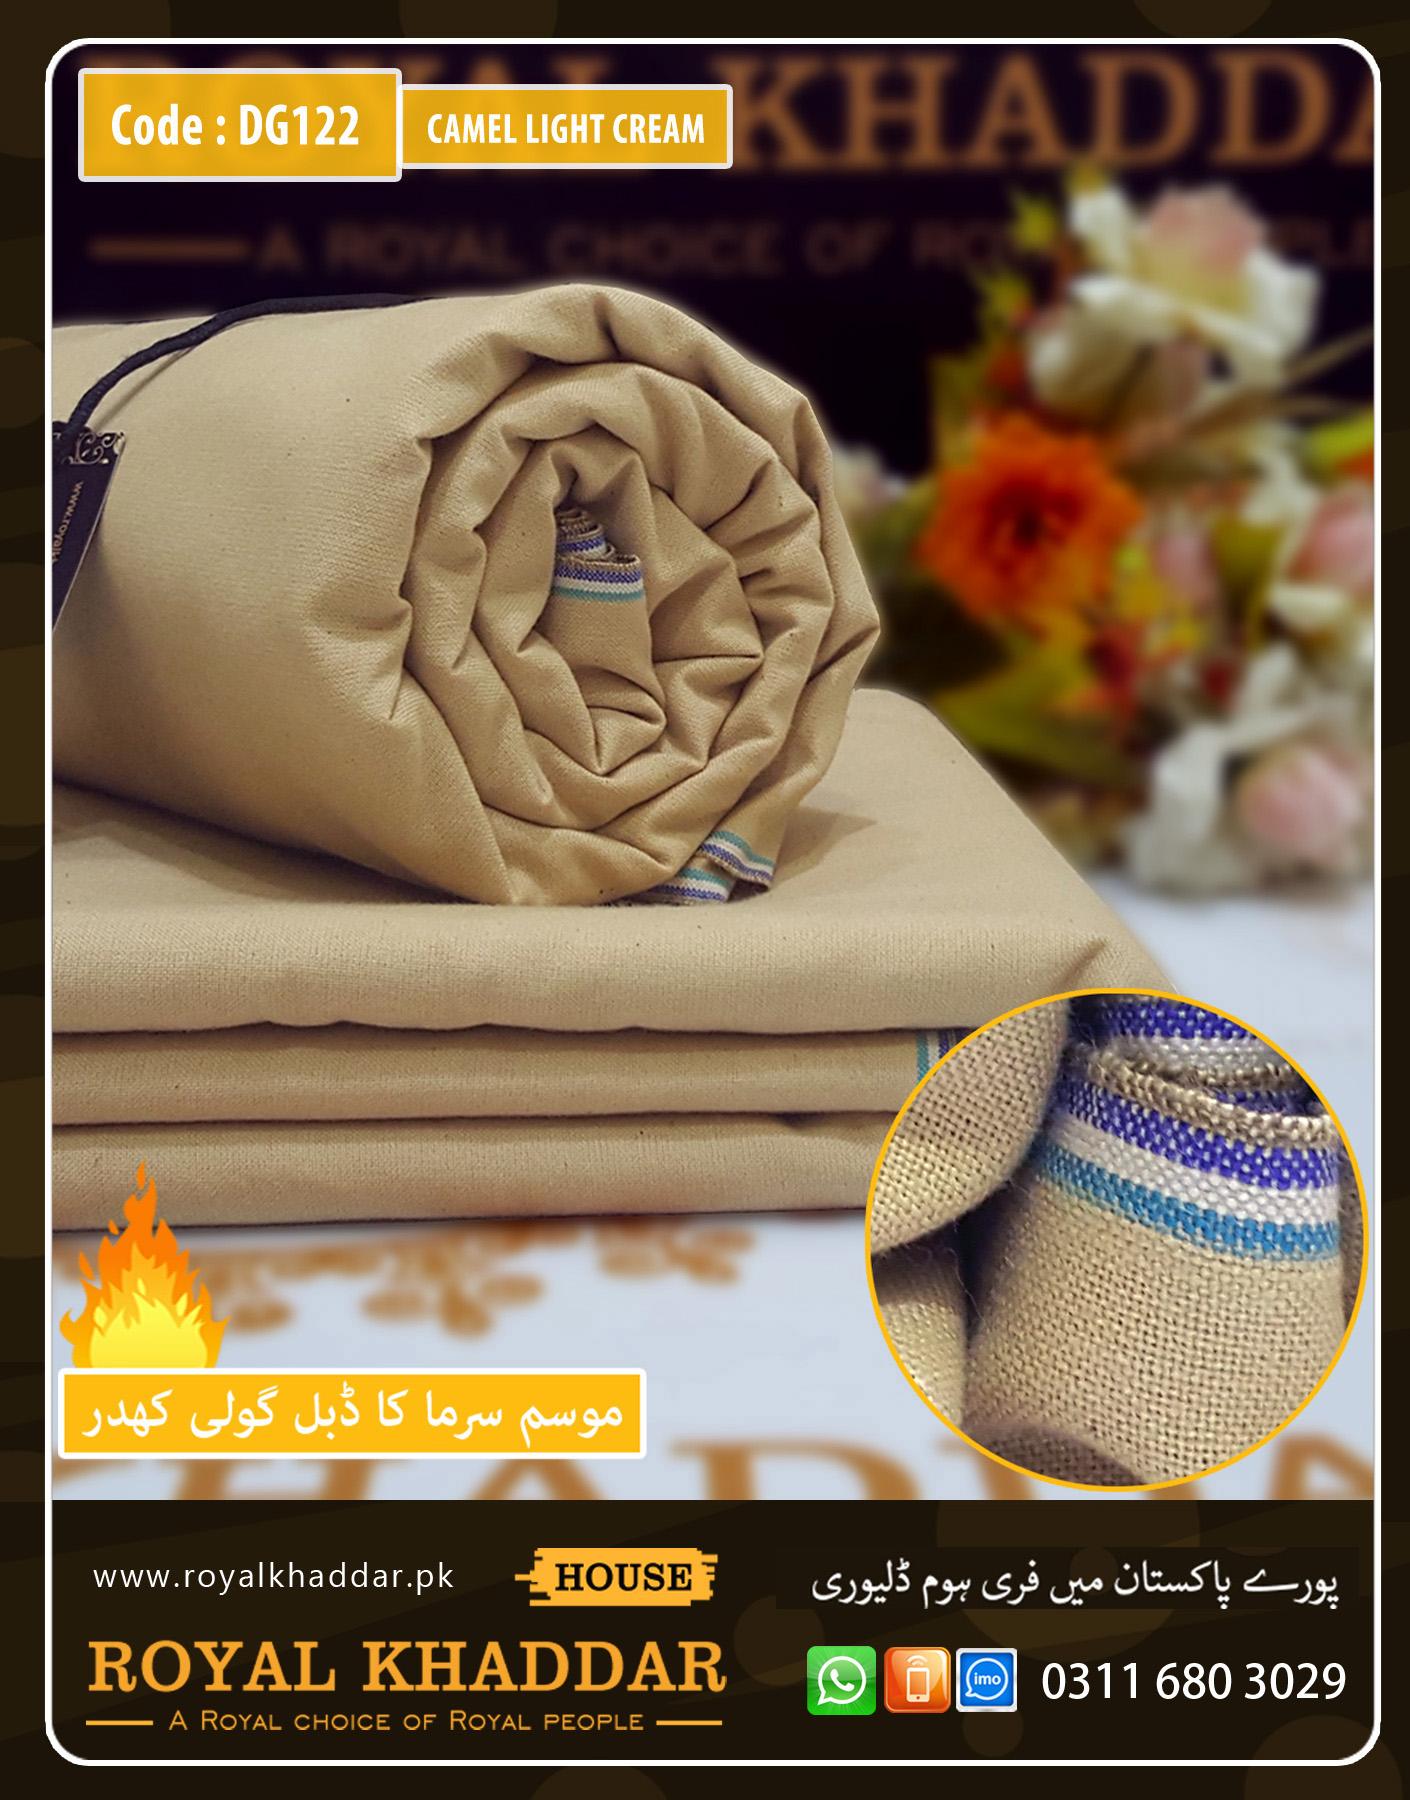 DG122 Camel Light Cream Double Goli Winter Khaddar